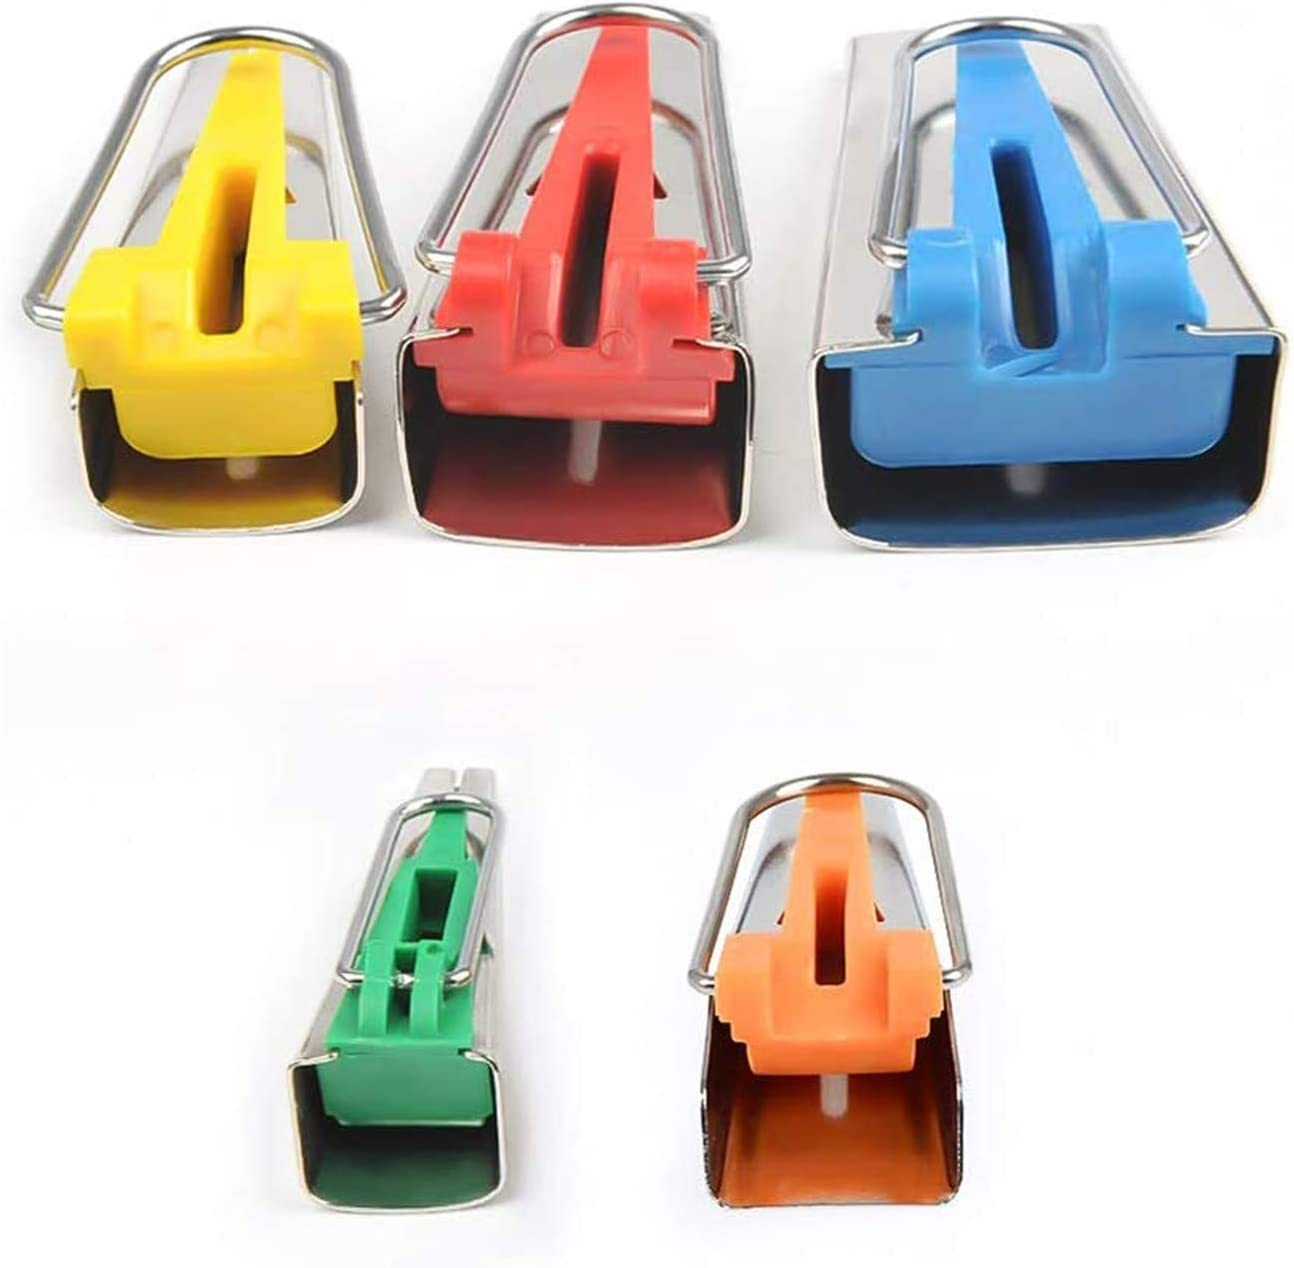 4 tama/ños Conjunto de 4 tama/ños de tela Bias Tape Maker Kit Set Multicolor DIY Craft Coser Quilting Tool 6mm 9mm 12mm 18mm 25mm